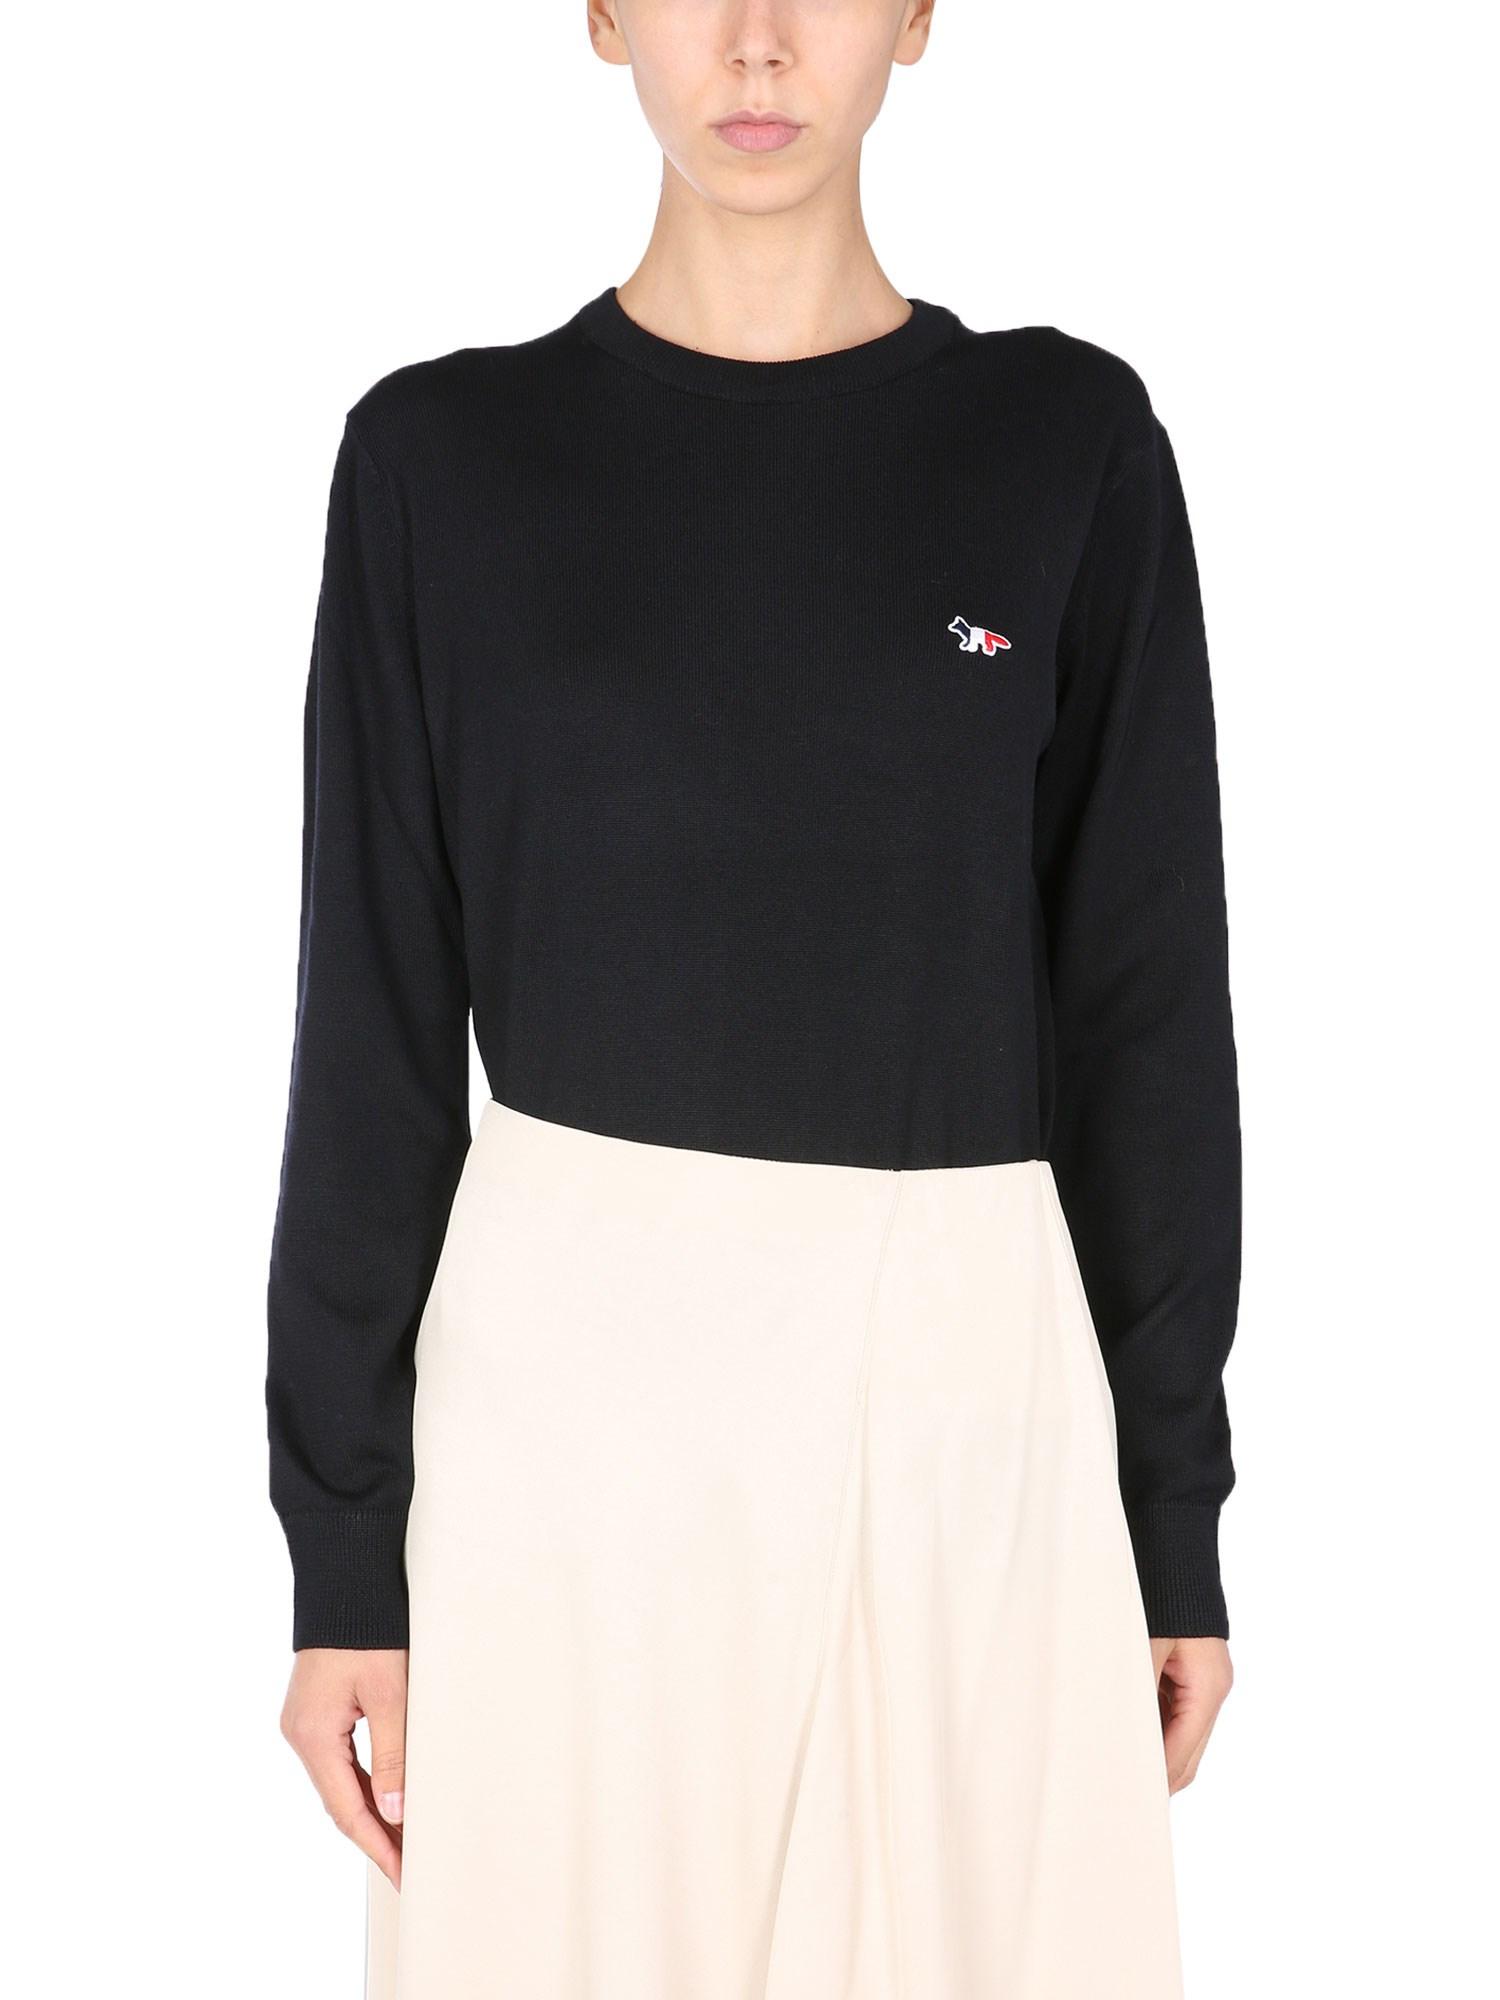 Sweater with tricolour fox patch - maison kitsuné - Modalova